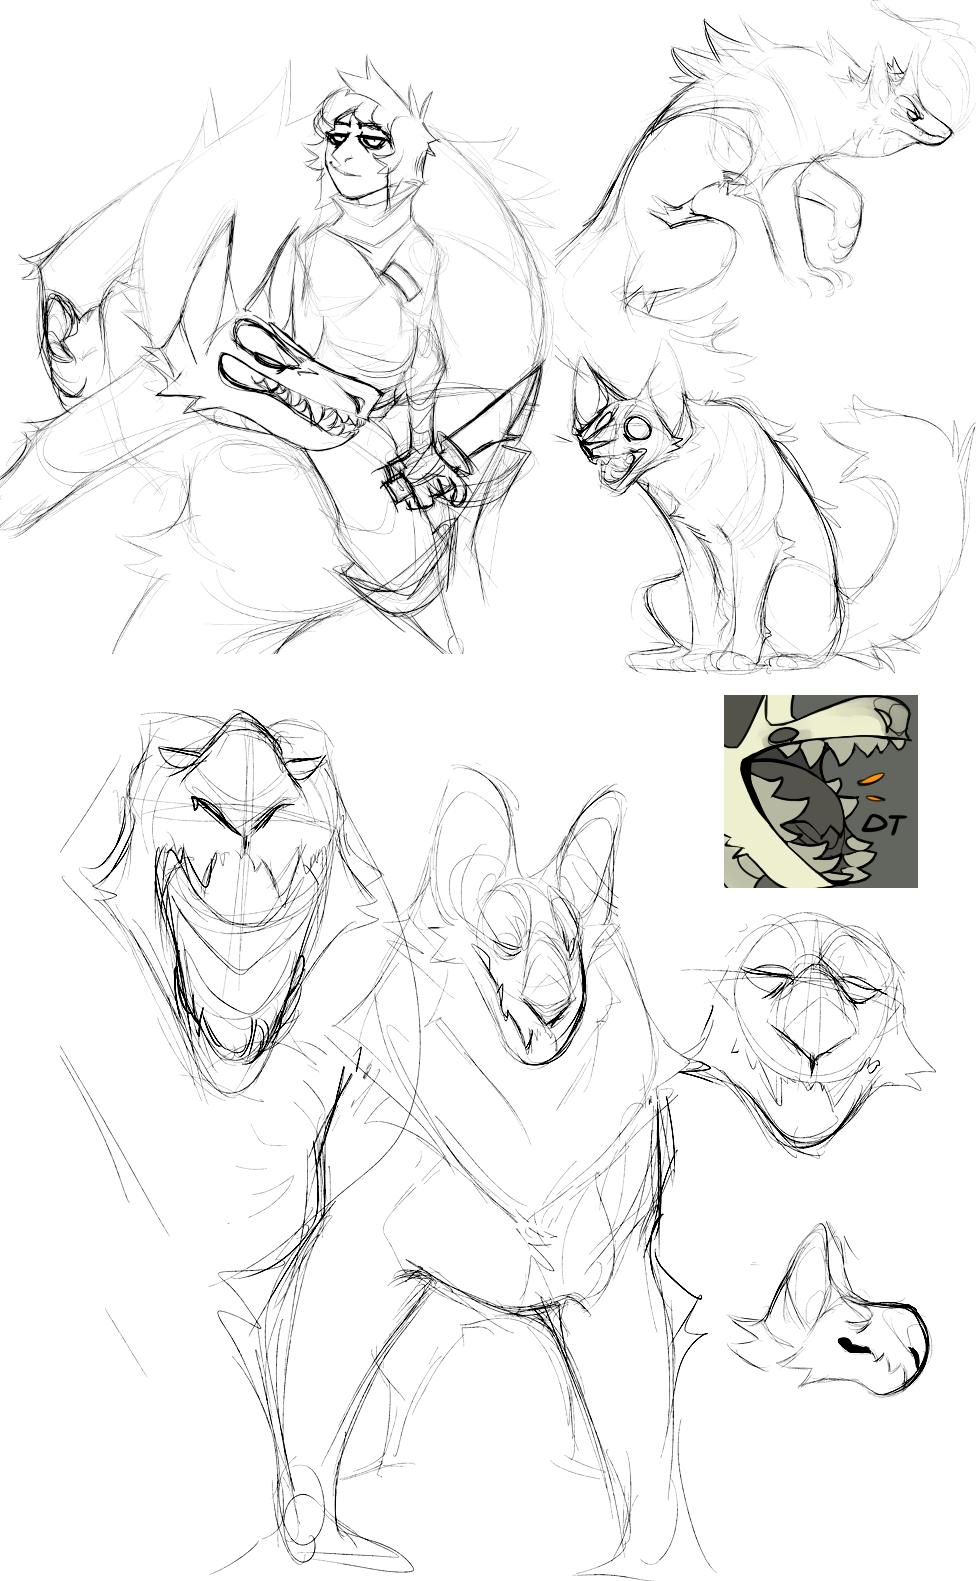 sketch dump no.7